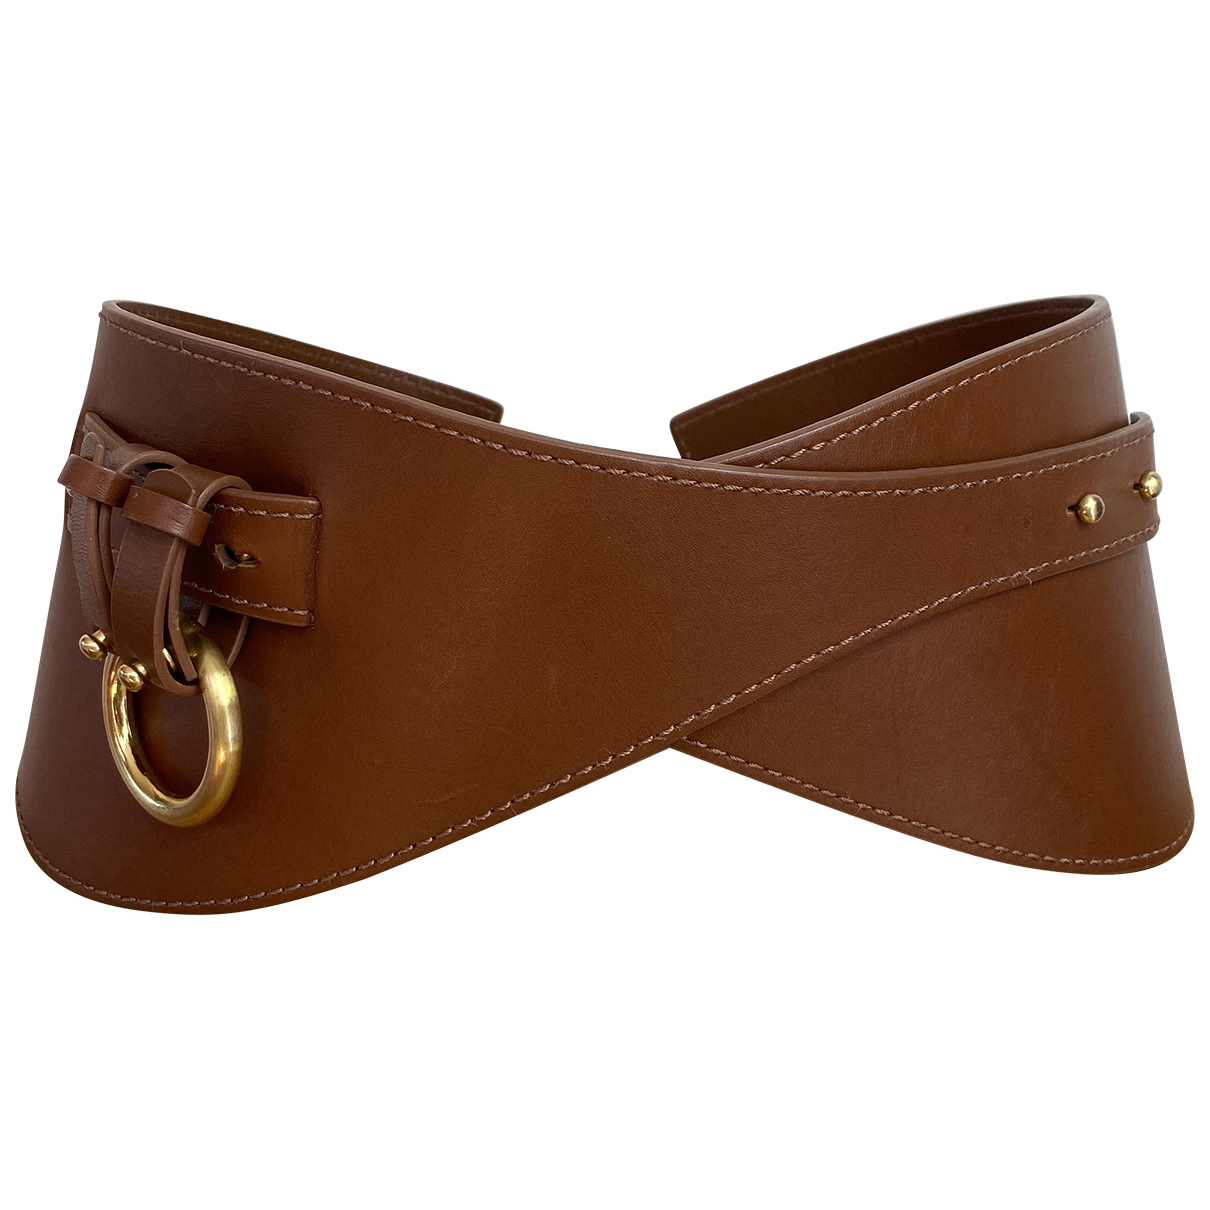 Zimmermann \N Brown Leather belt for Women XS International